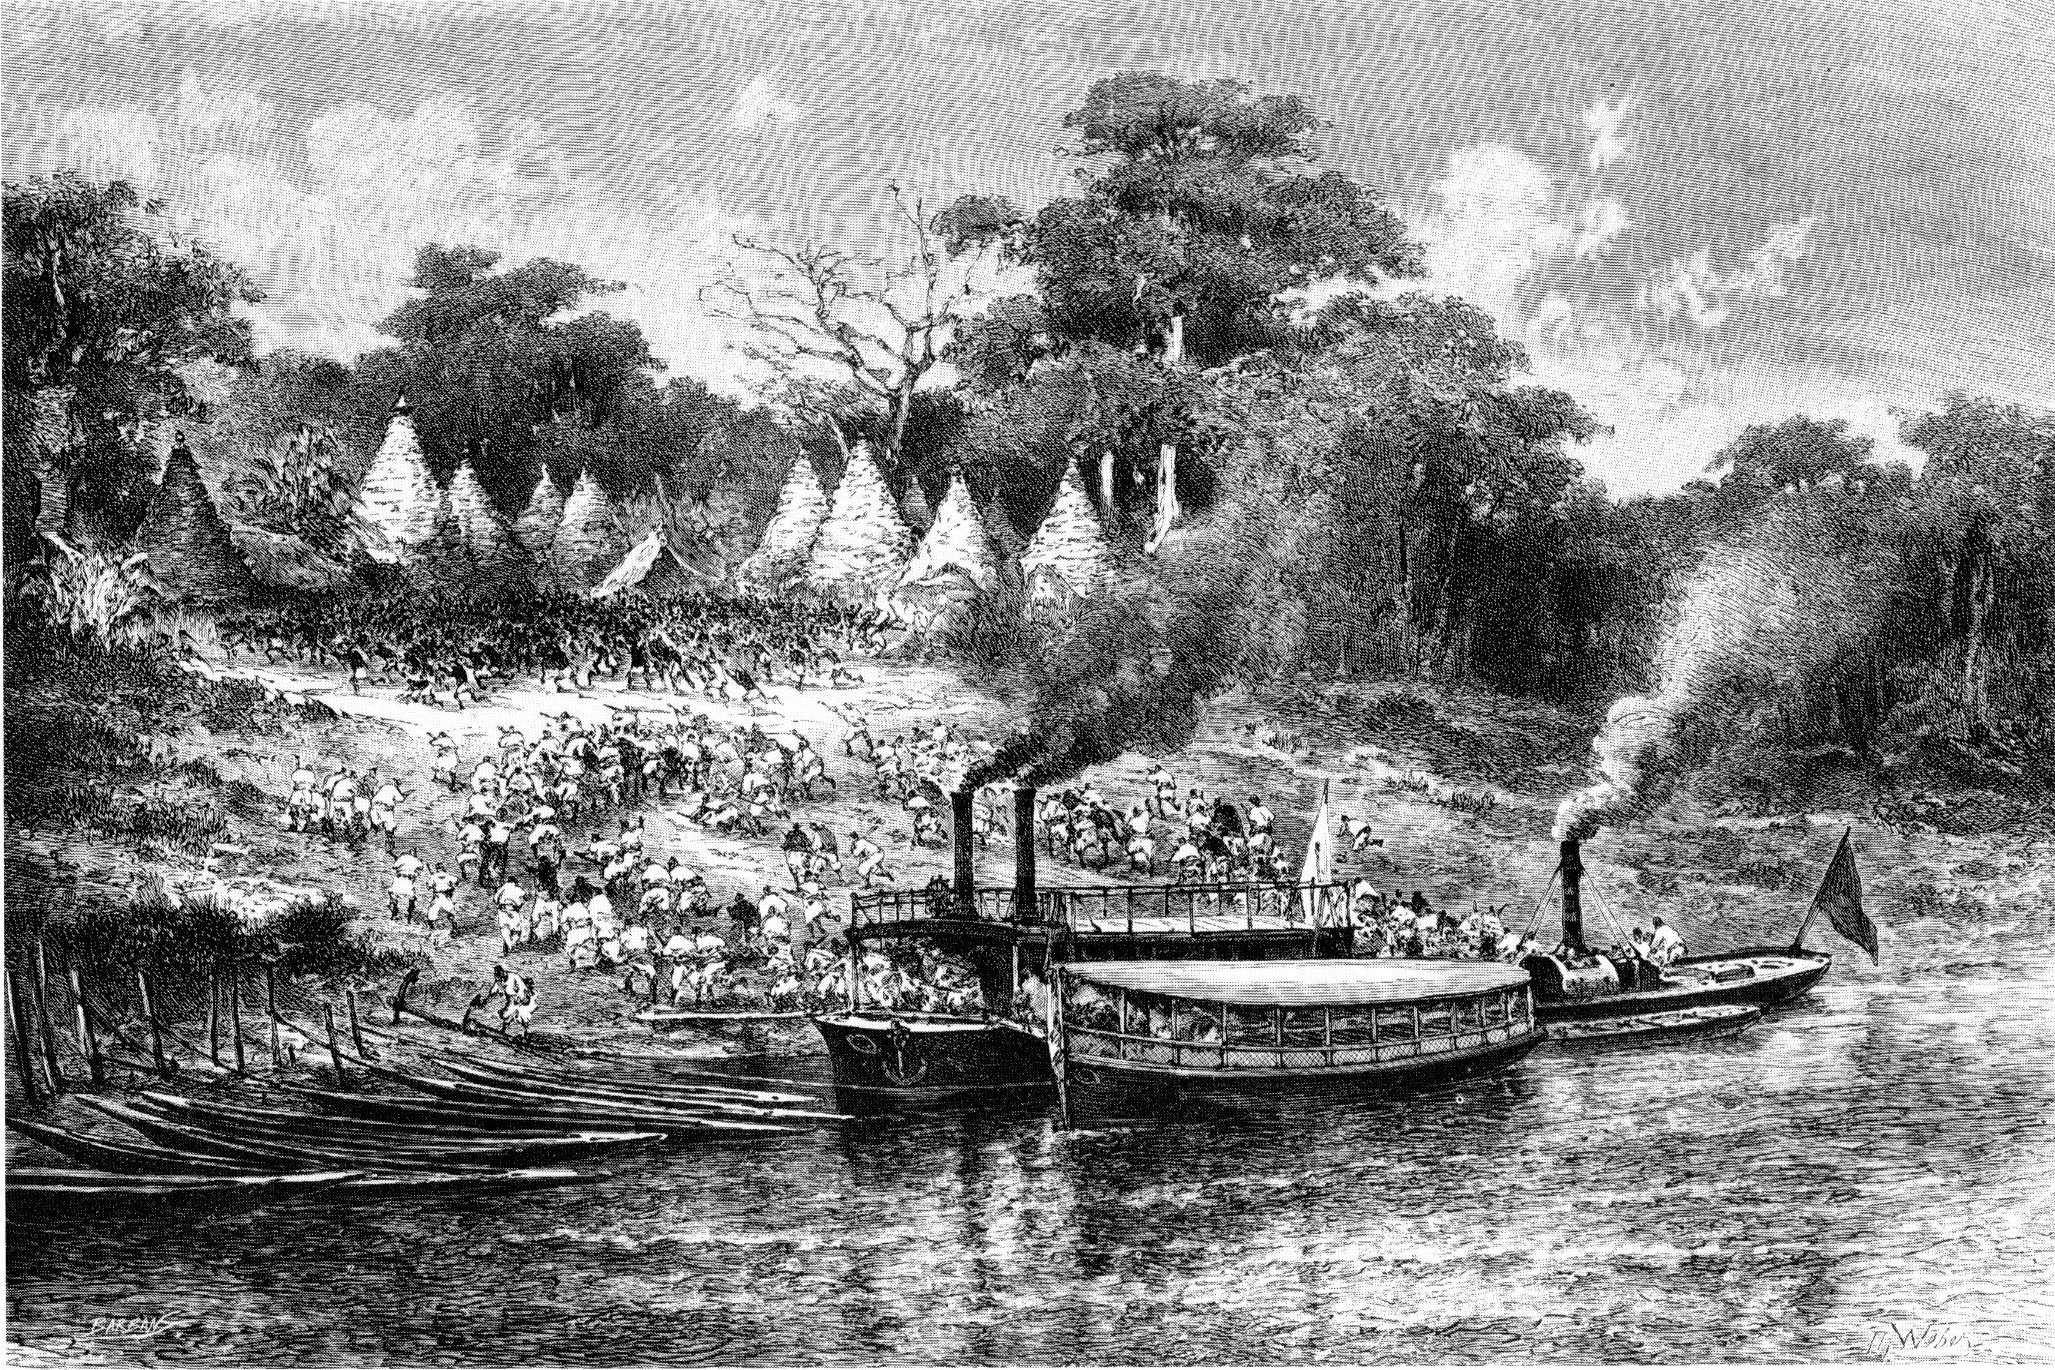 File:Yambuya RDC Congo 1890.jpg